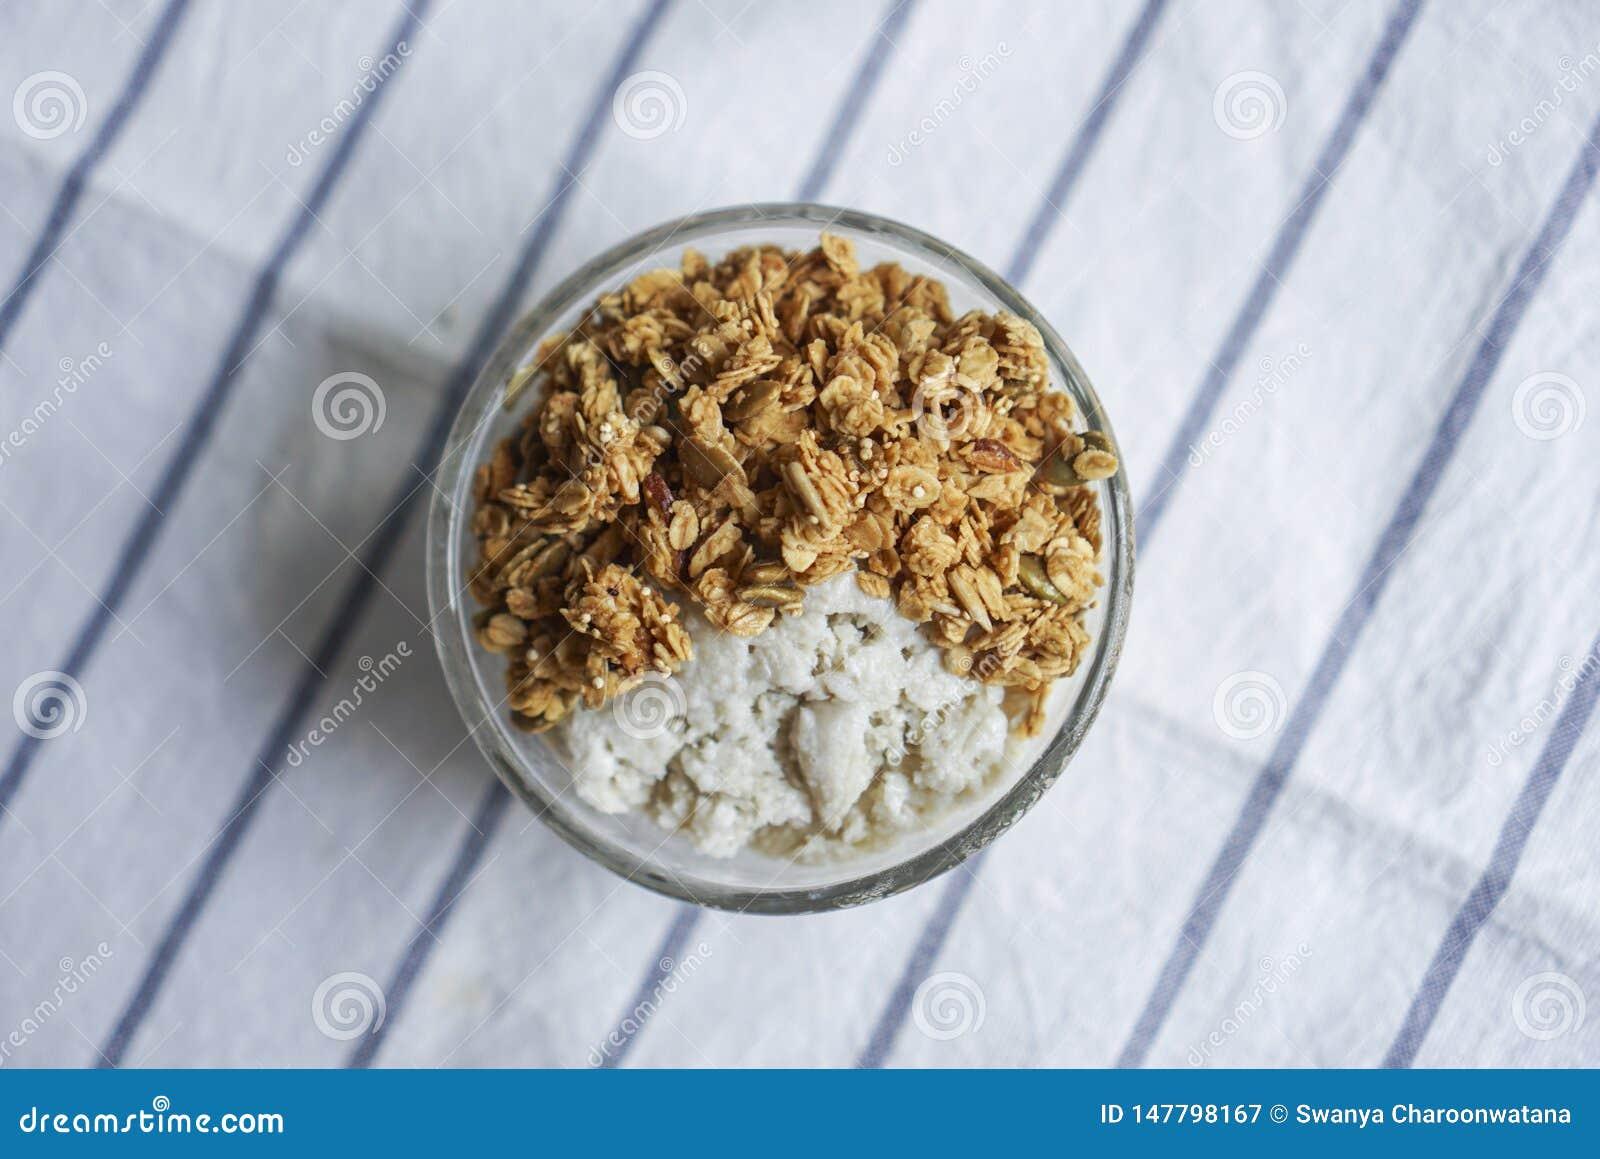 A bowl of healthy parfait, homemade granola.